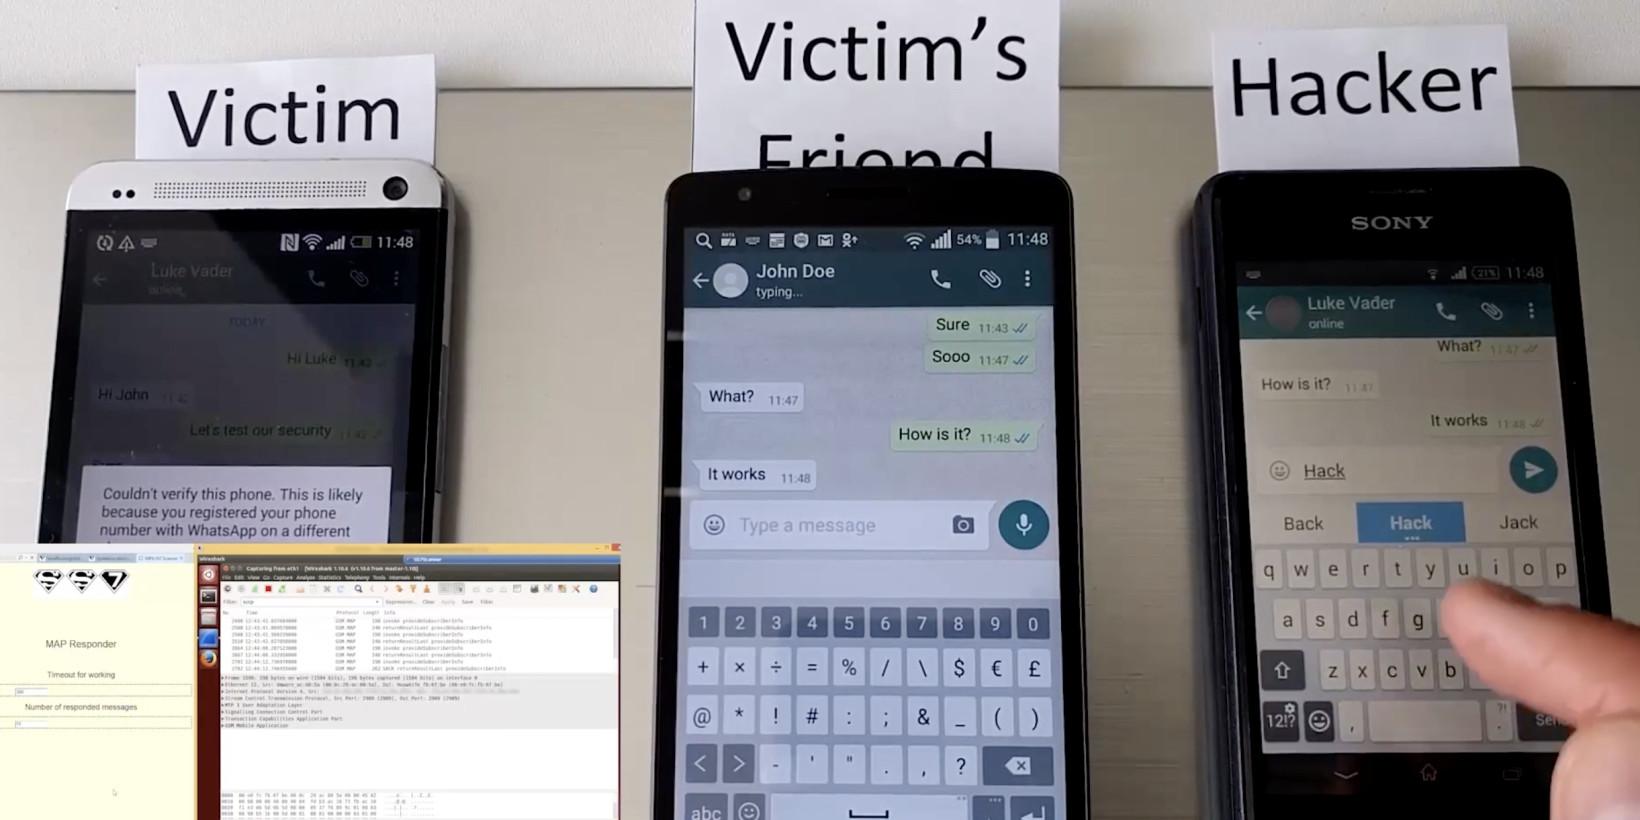 Watch hackers hijack WhatsApp and Telegram accounts using known telecom flaw